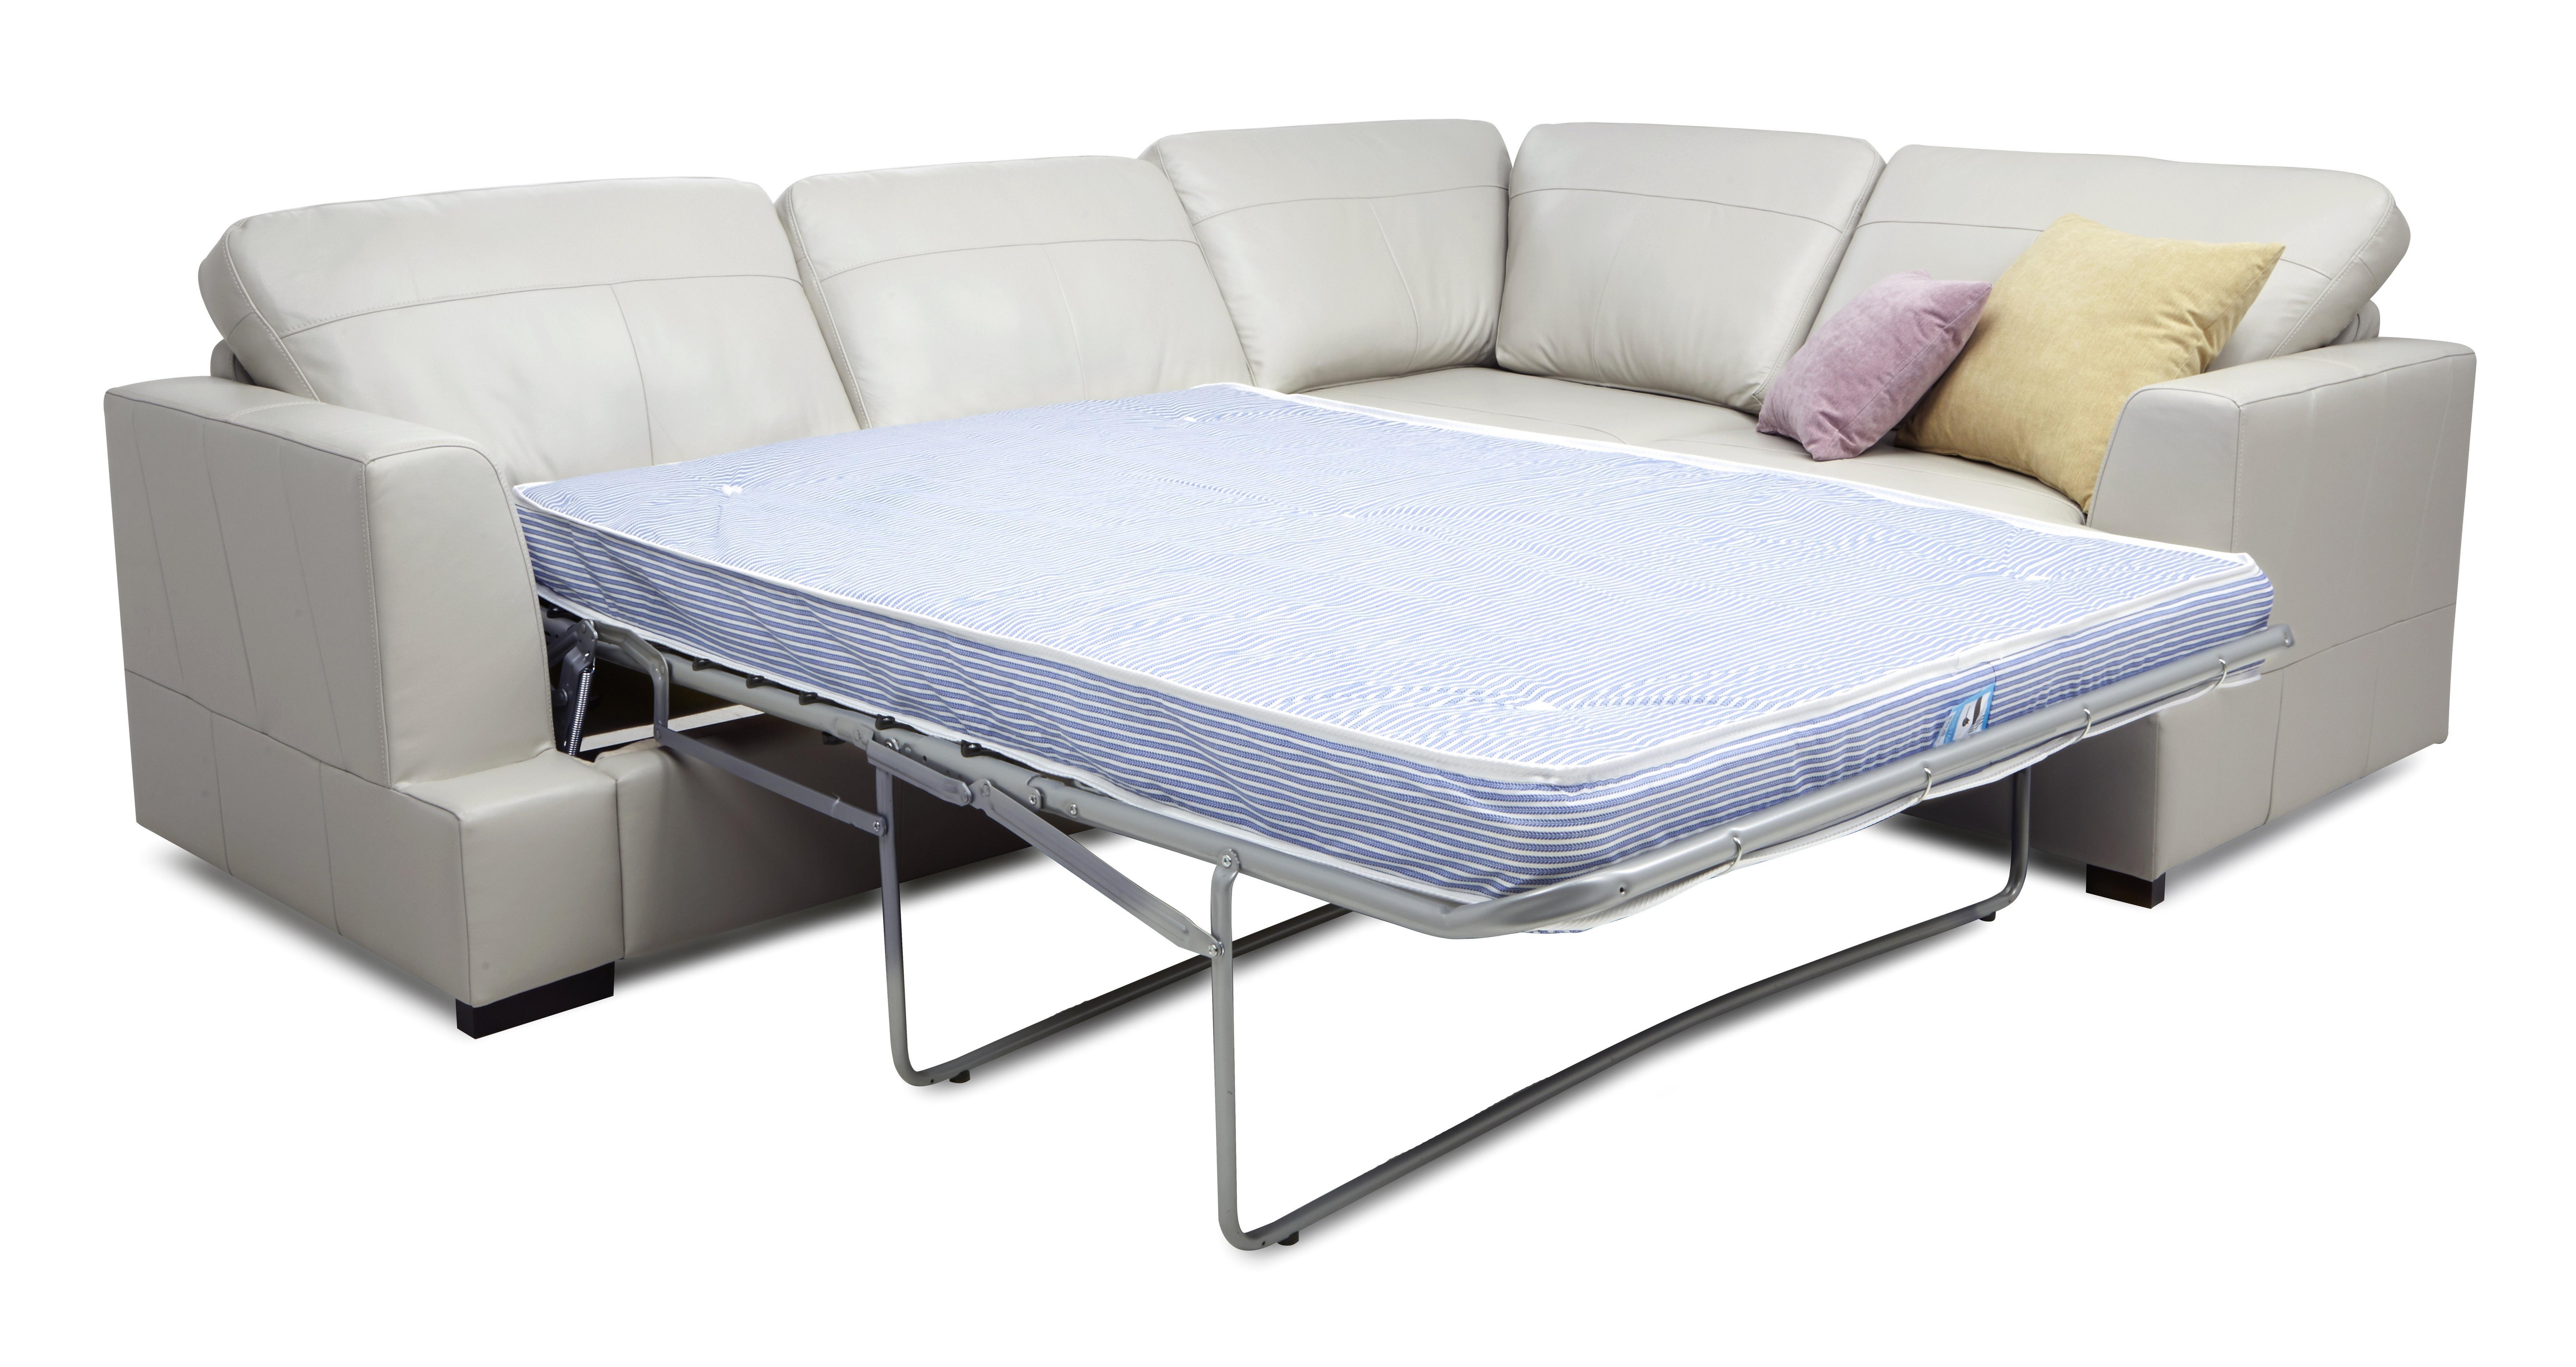 felix leather lh corner chaise sofa bed sectional ottawa dfs freya brokeasshome